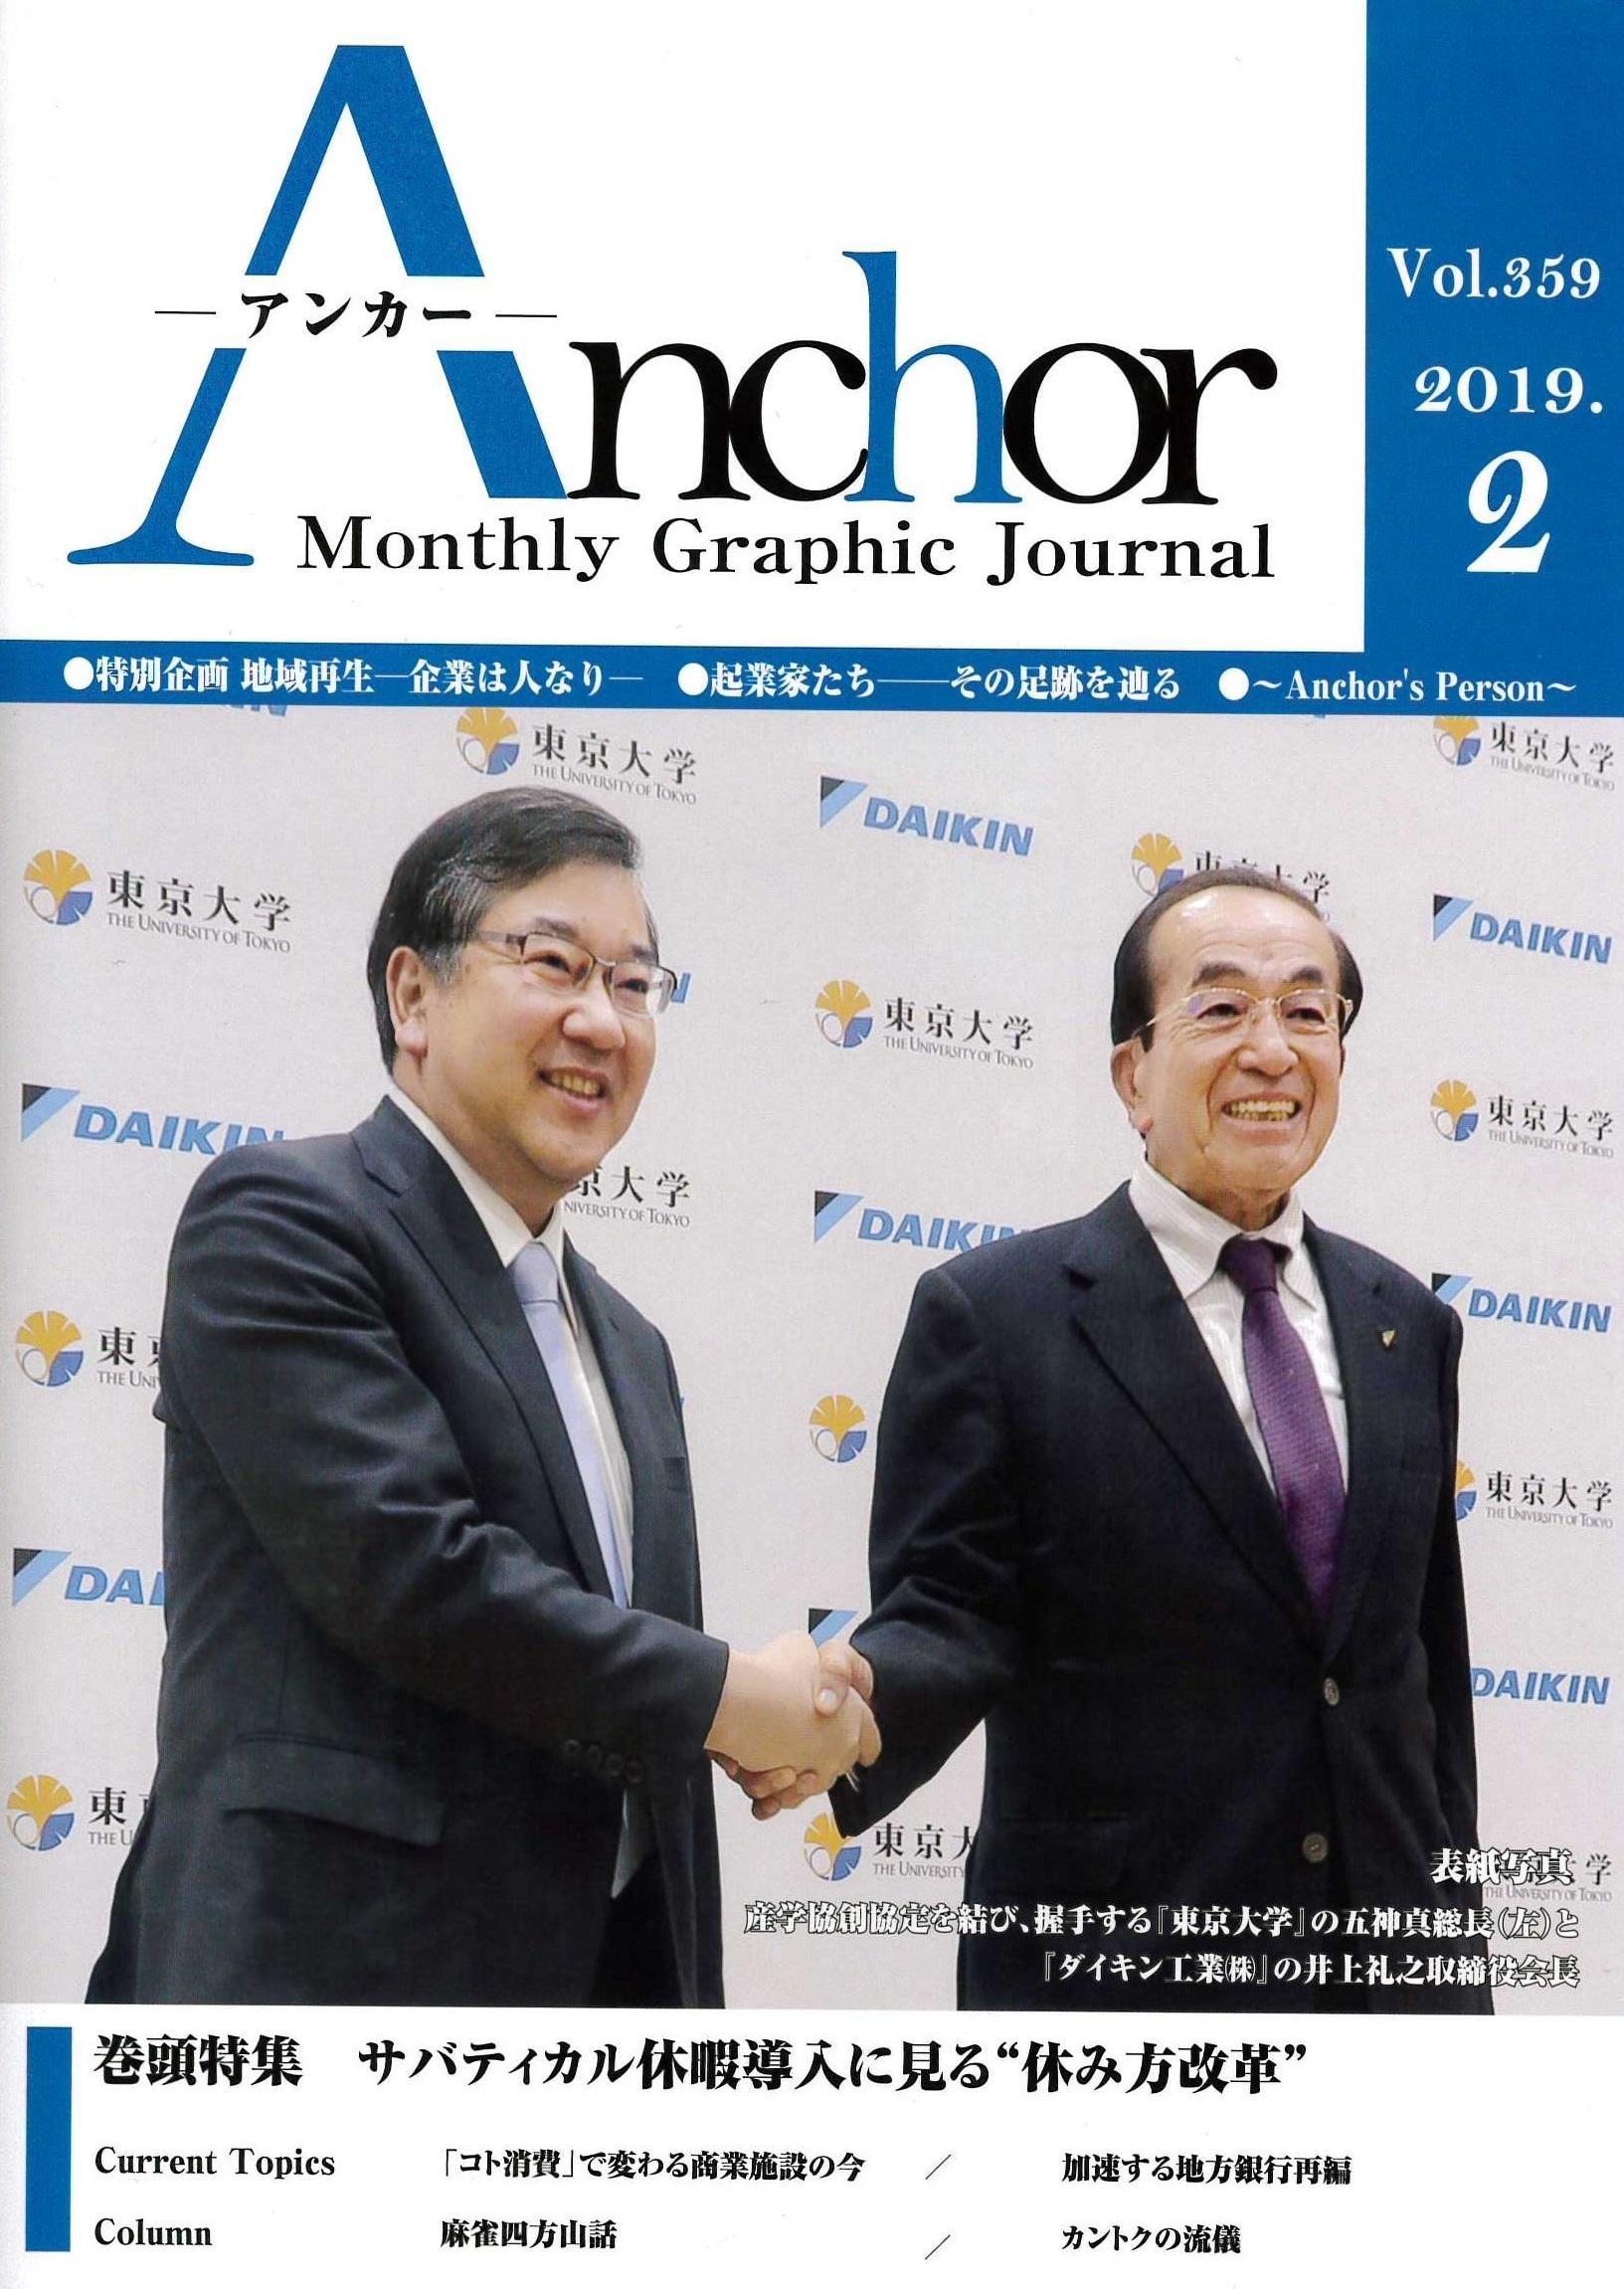 「Anchor」vol.359 (2019年2月1日発売)に弊社が掲載されました!